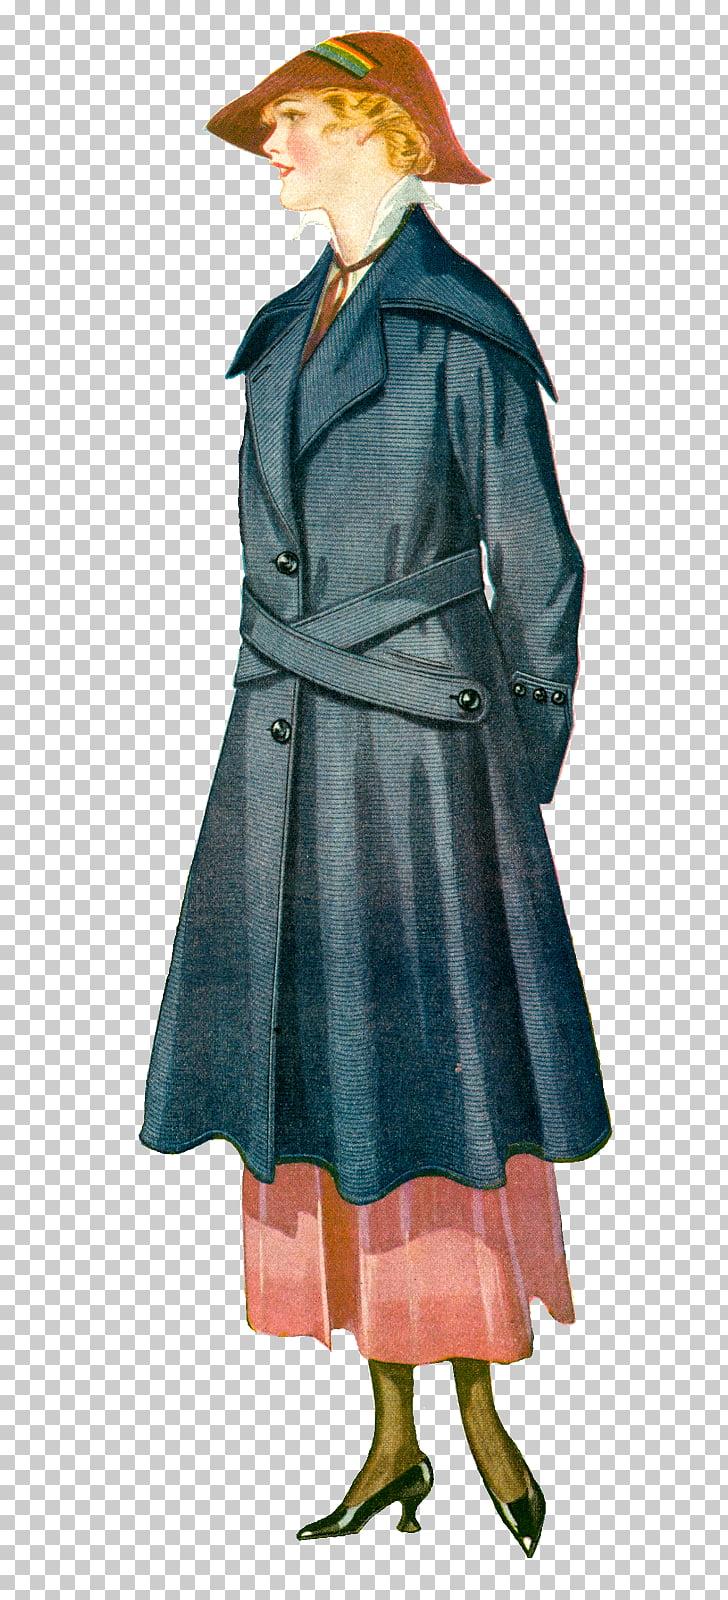 Fashion Vintage clothing , Women coat PNG clipart.